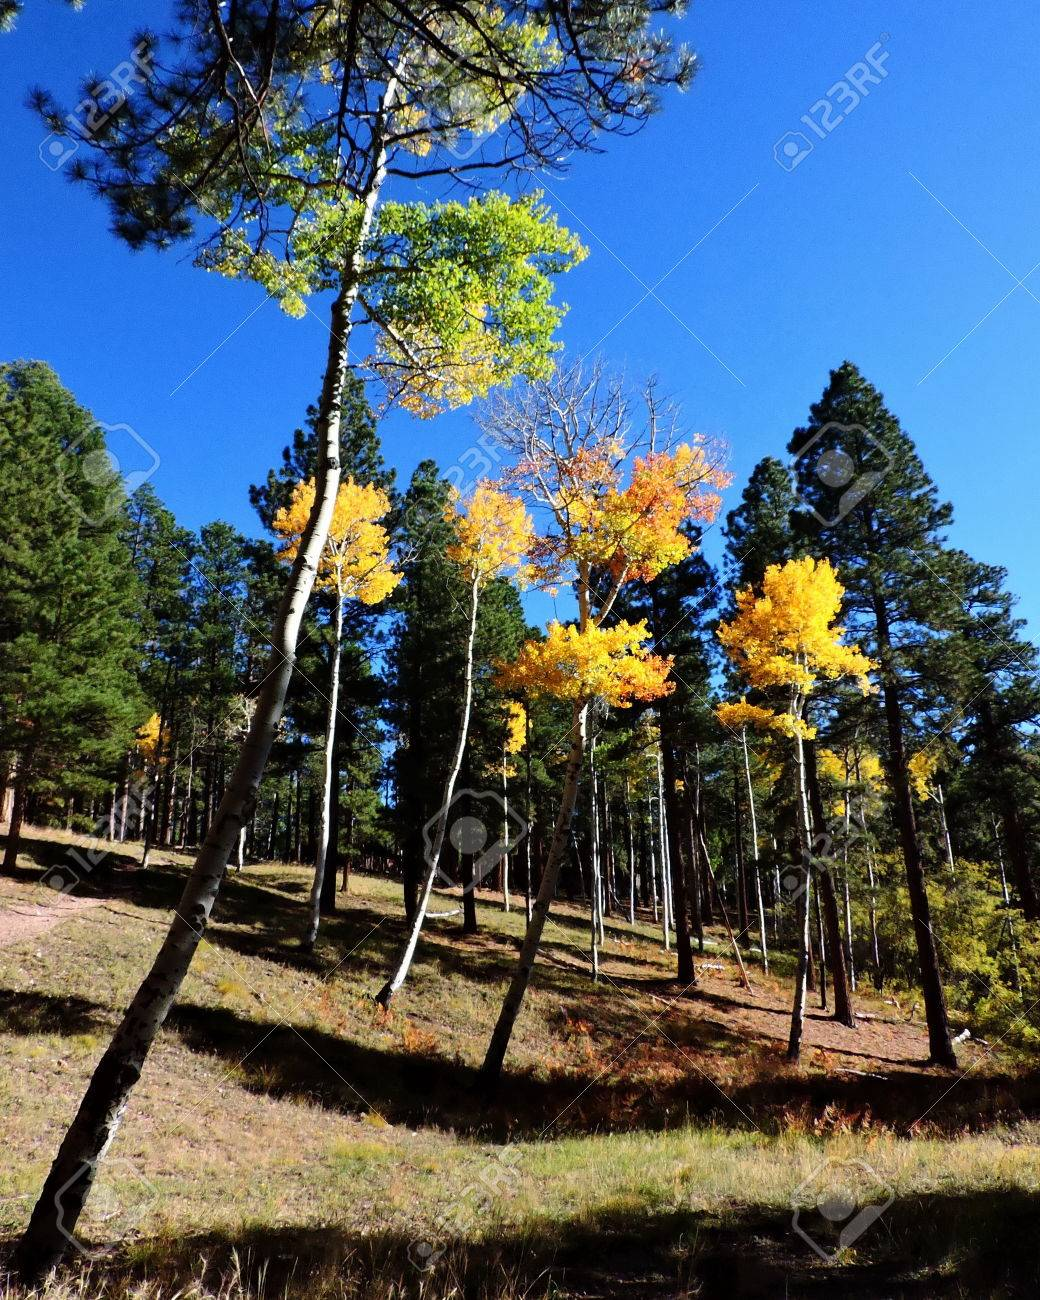 Aspen Leaves Trees Forest Autumn Stock Photo - 56978308